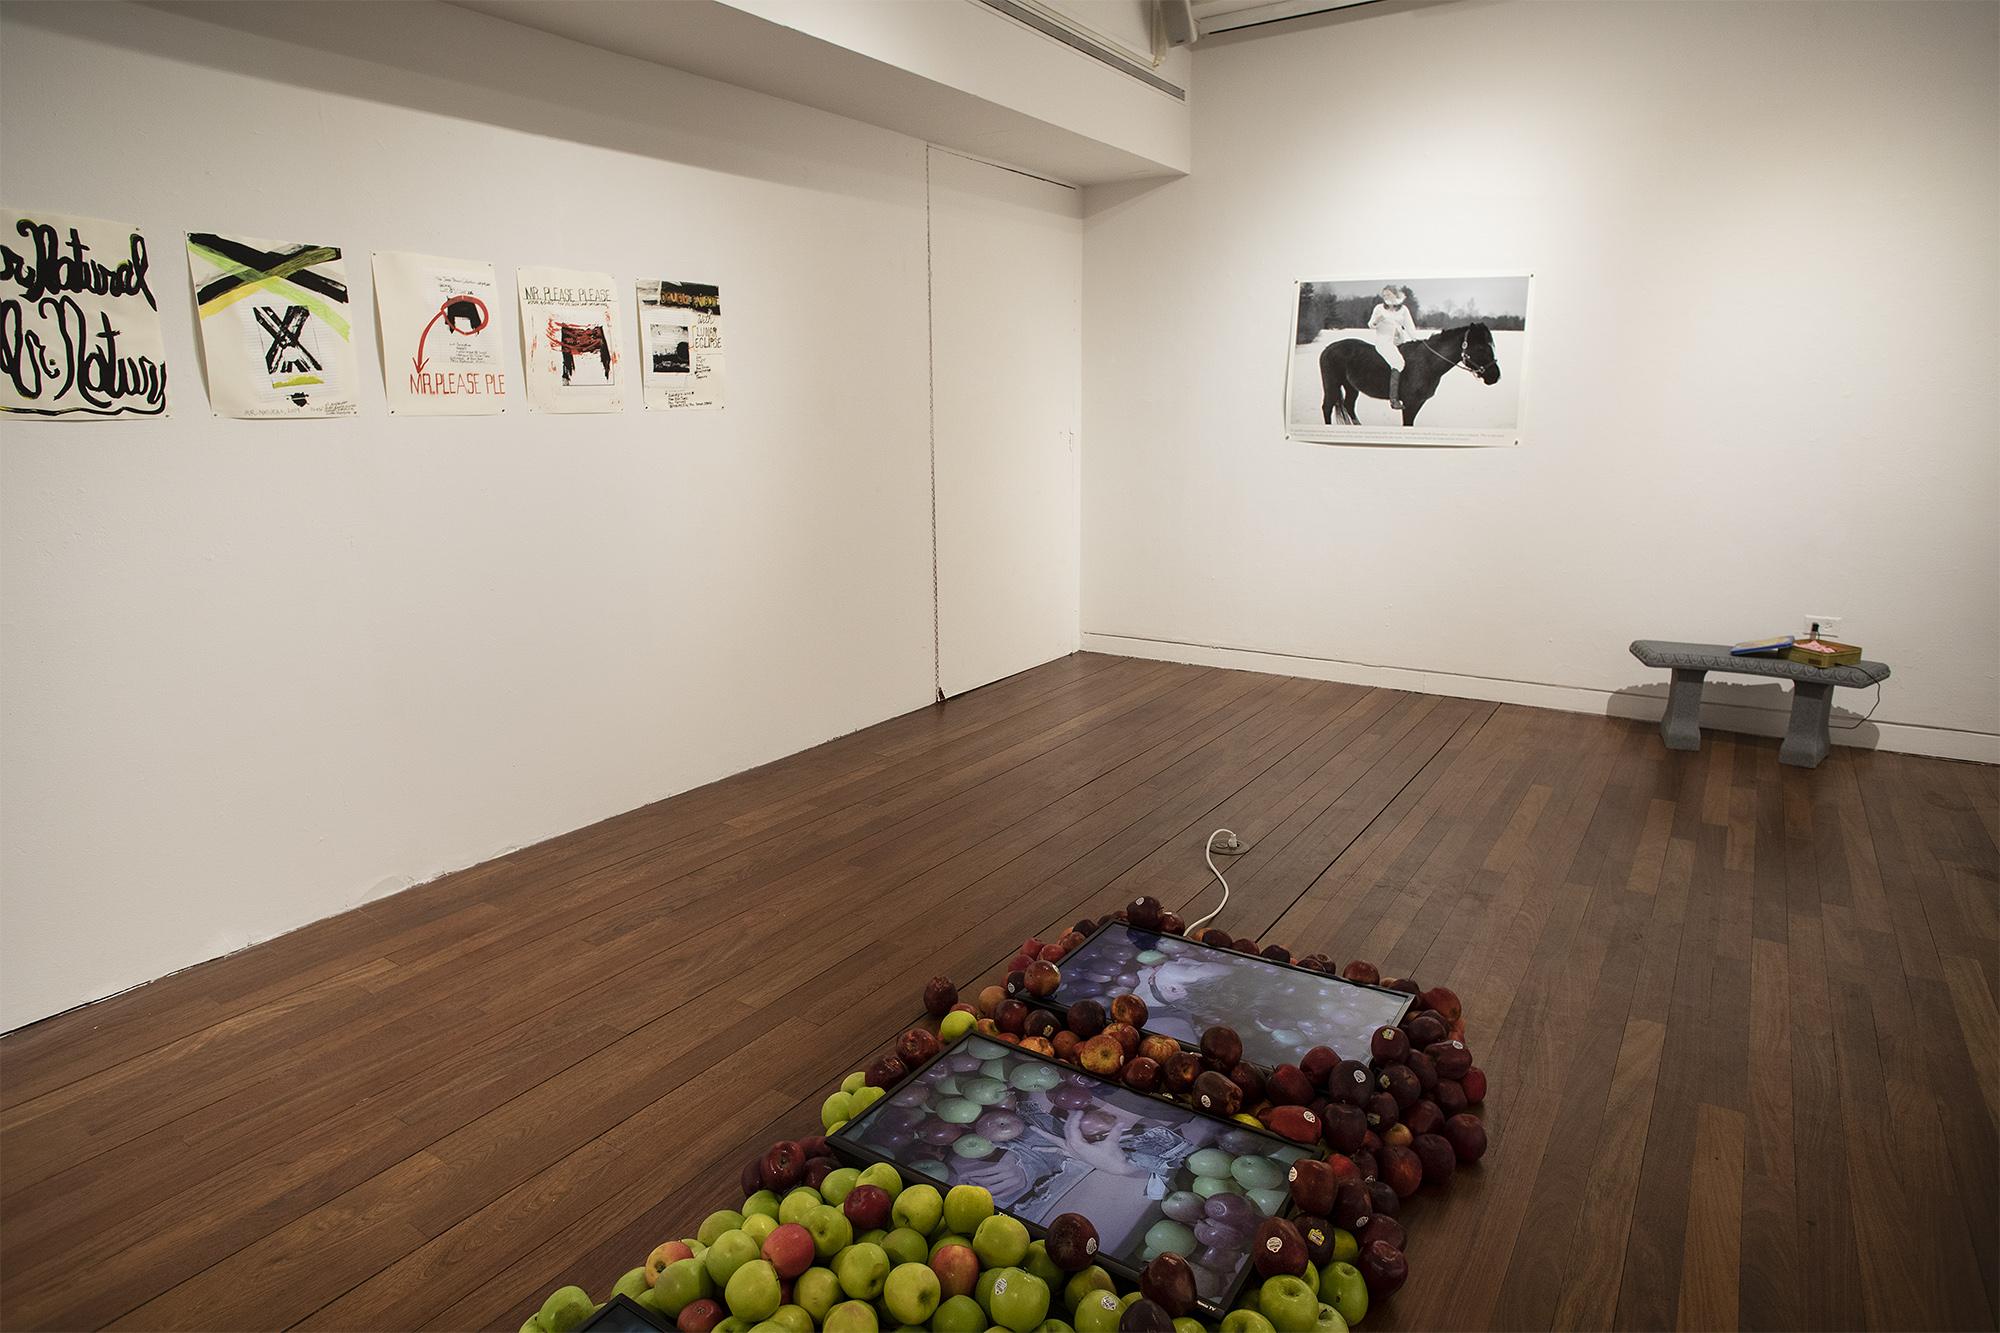 works by Aika Akhmetova, Rochelle Feinstein, Dana Hoey, Yifan Jiang